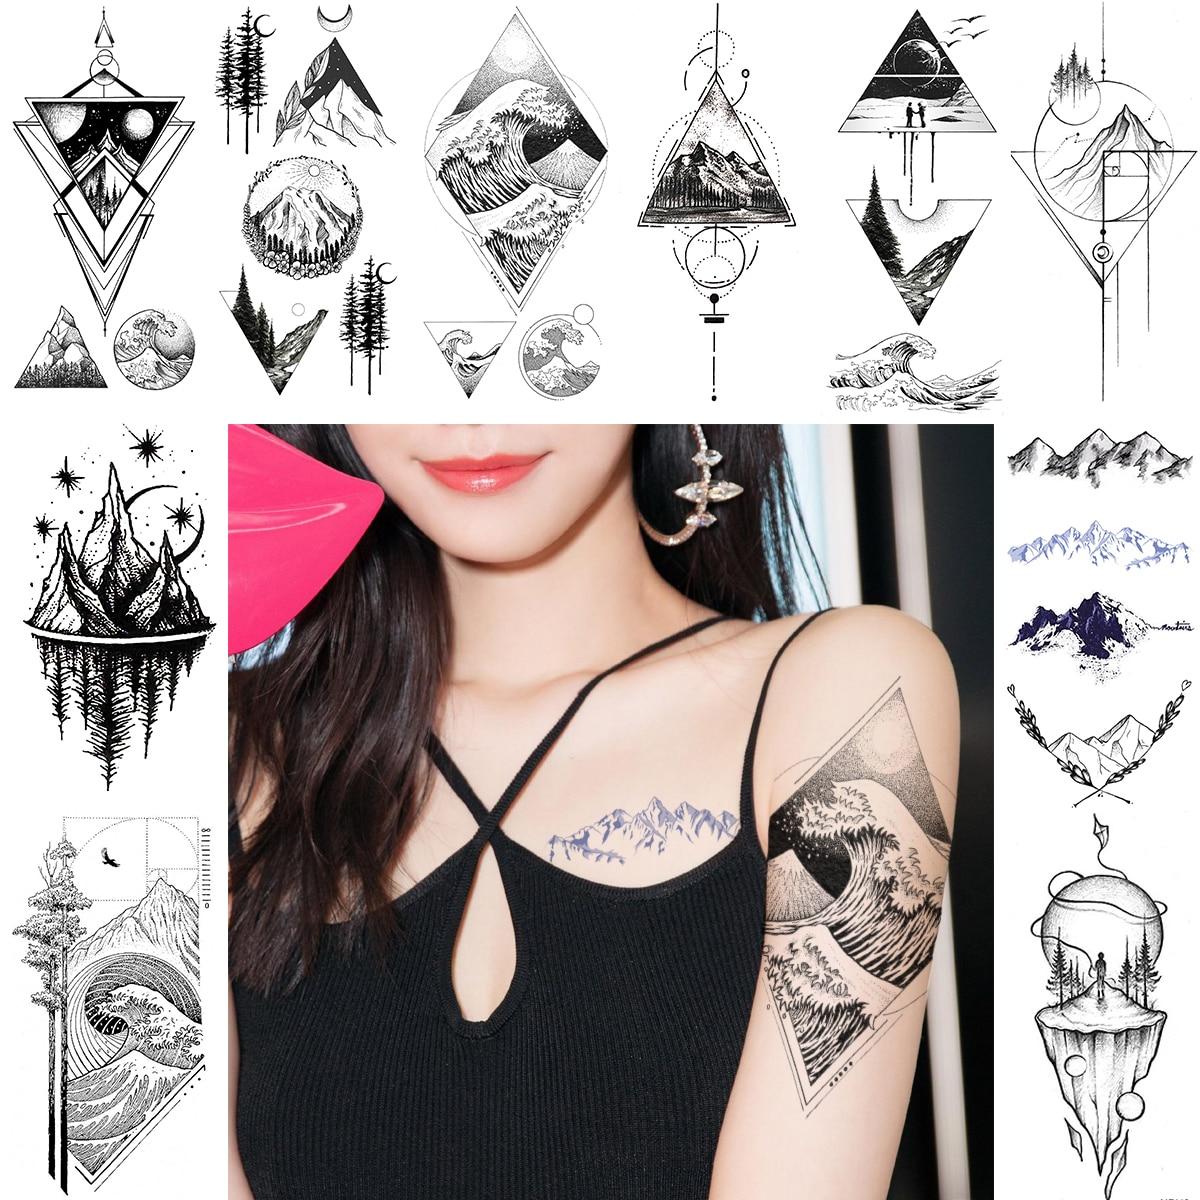 Diamond Rhombus Wave Temporary Tattoos Triangle Planets Mountain Tattoo Sticker For Men Women Geometric Body Art Arm Neck Tatoos